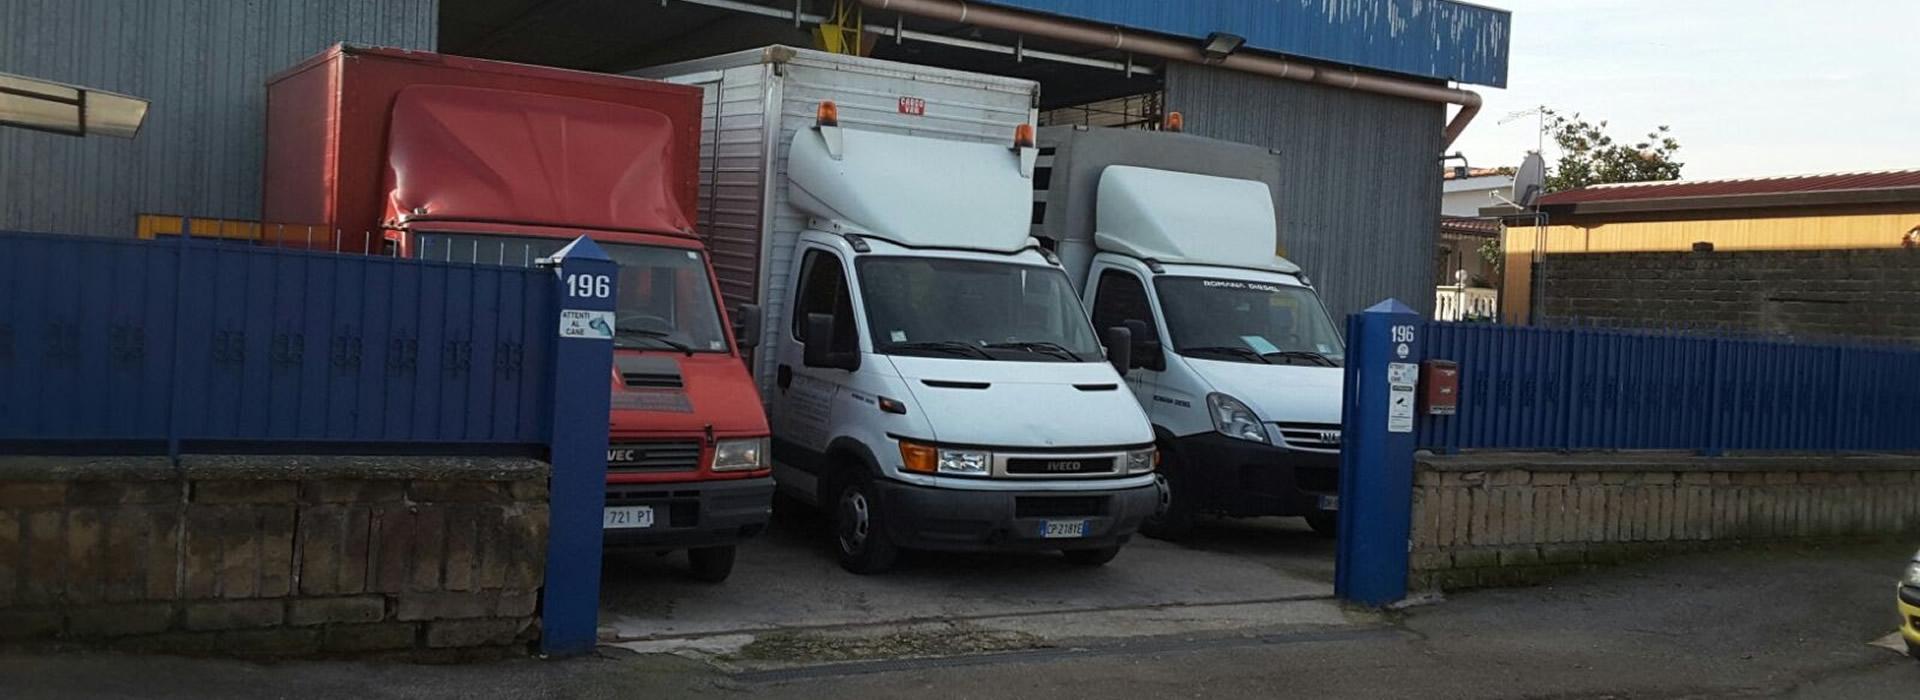 furgoni-2